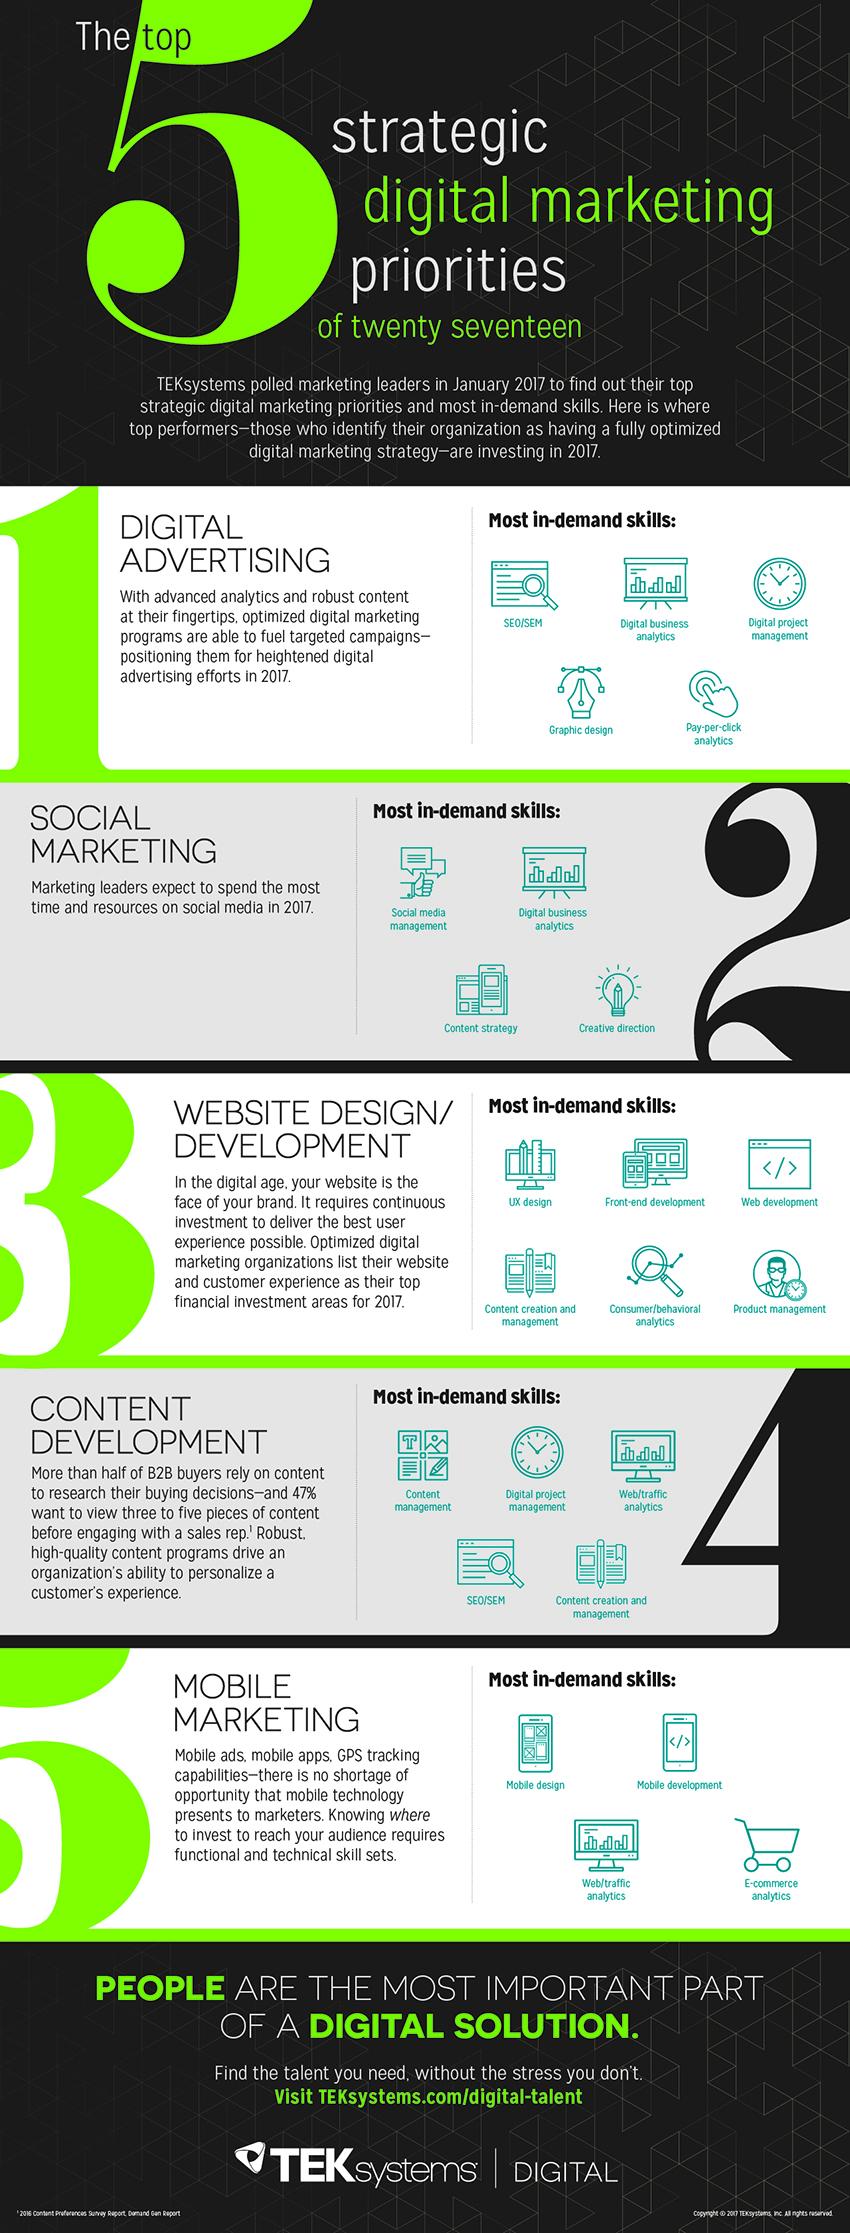 2017-digital-marketing-trends-infographic-850x2233.jpg